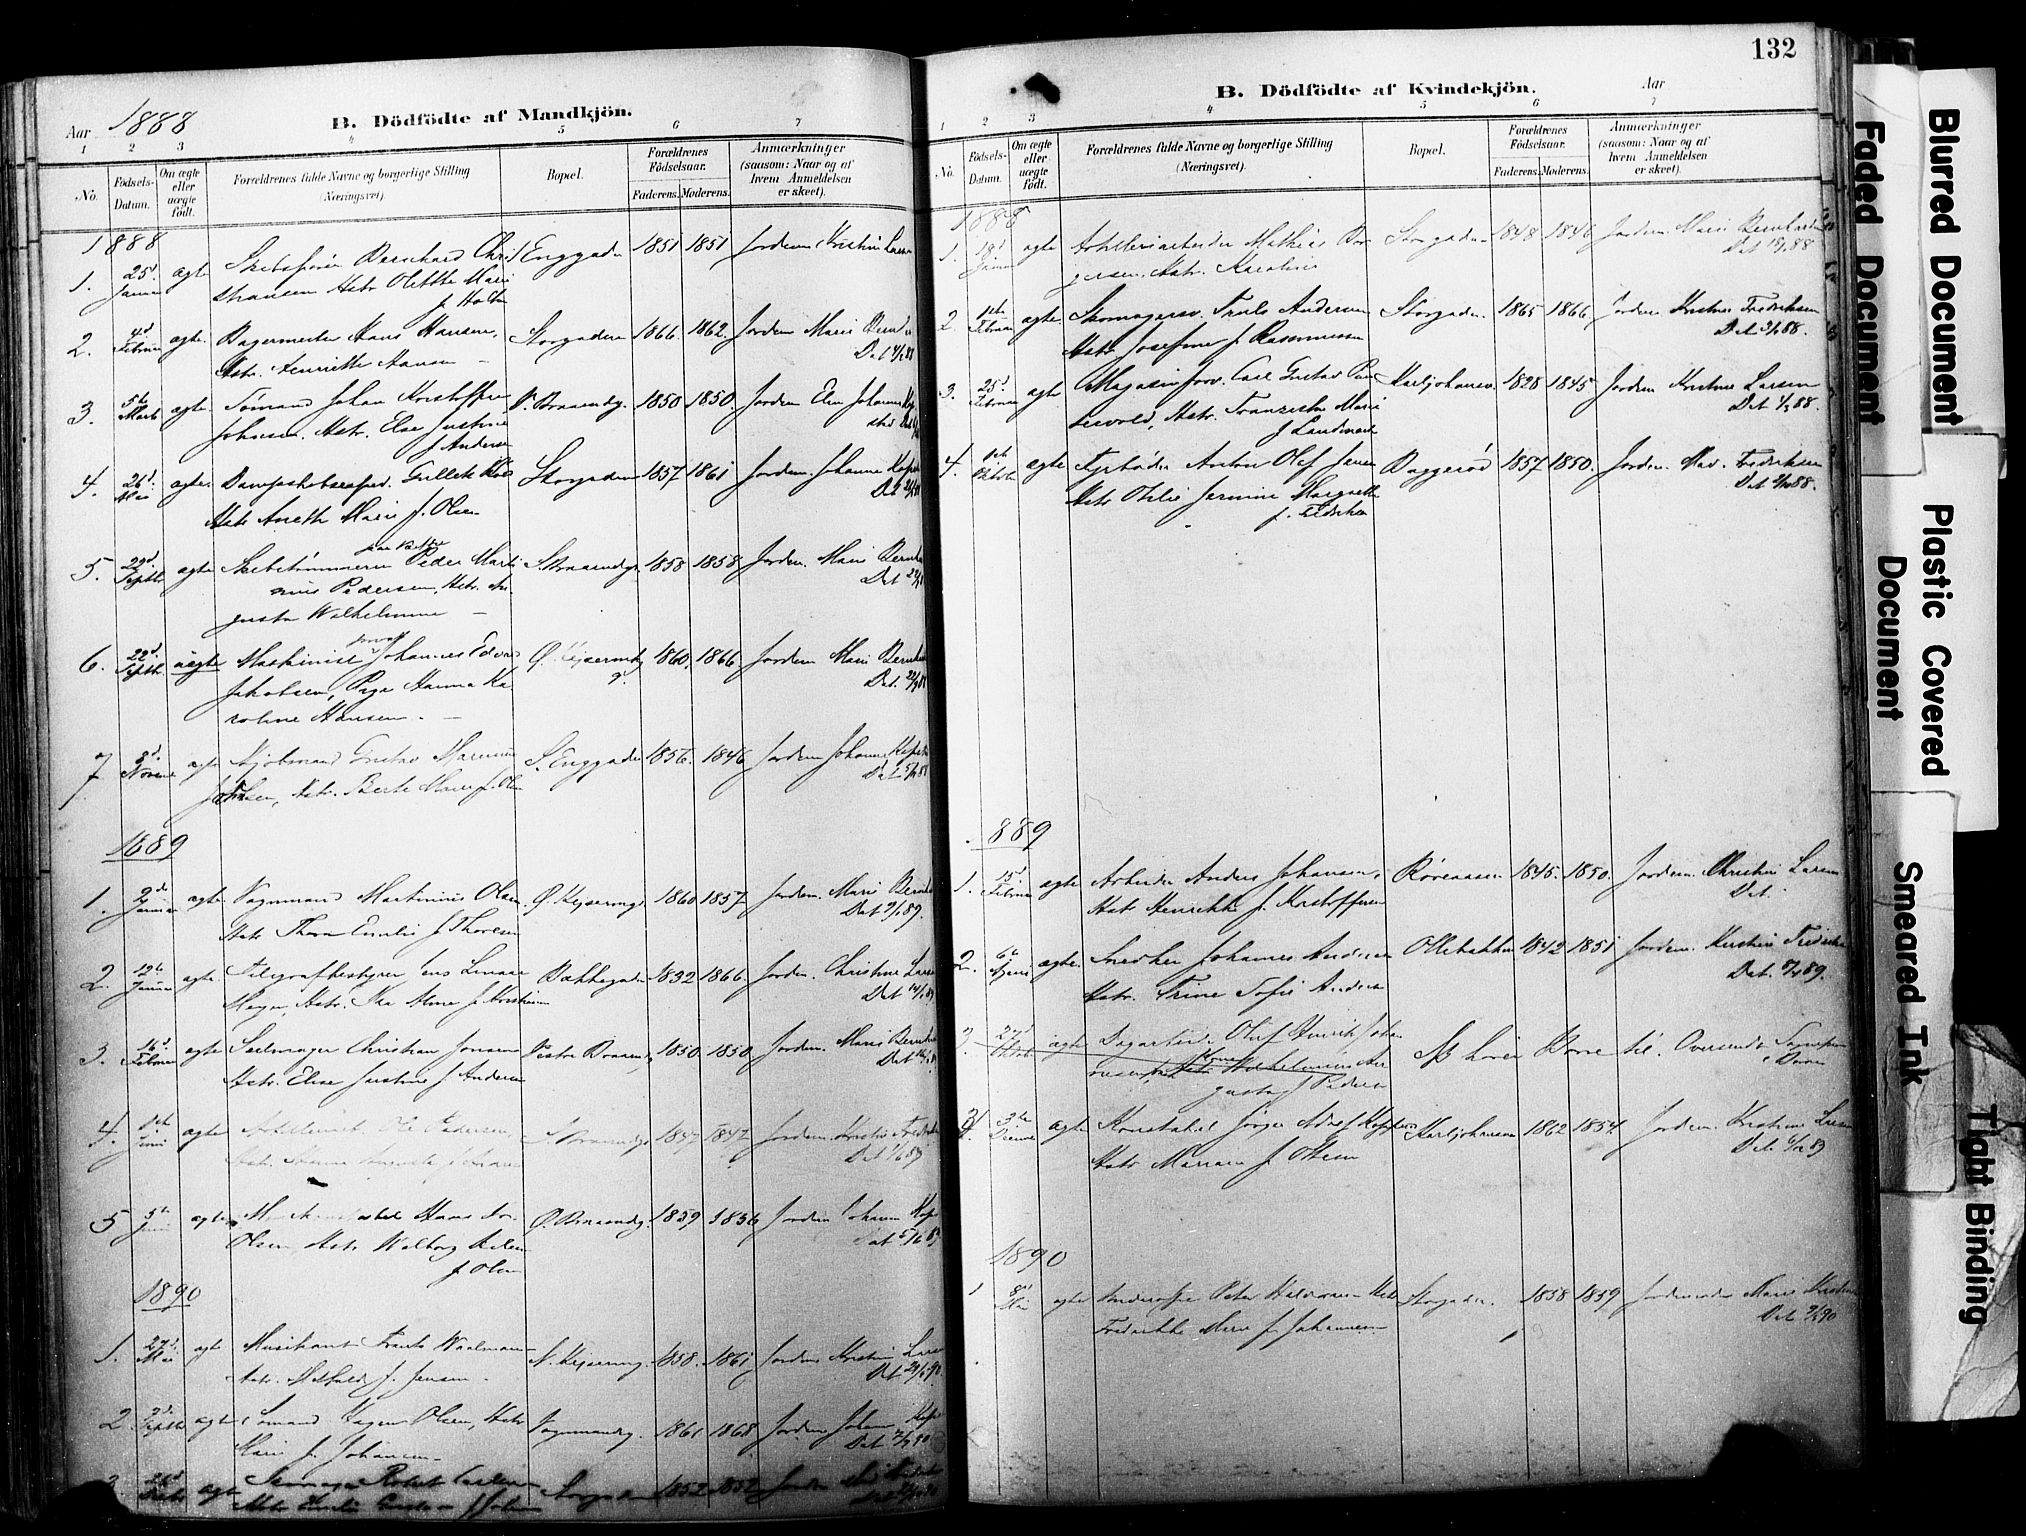 SAKO, Horten kirkebøker, F/Fa/L0004: Parish register (official) no. 4, 1888-1895, p. 132